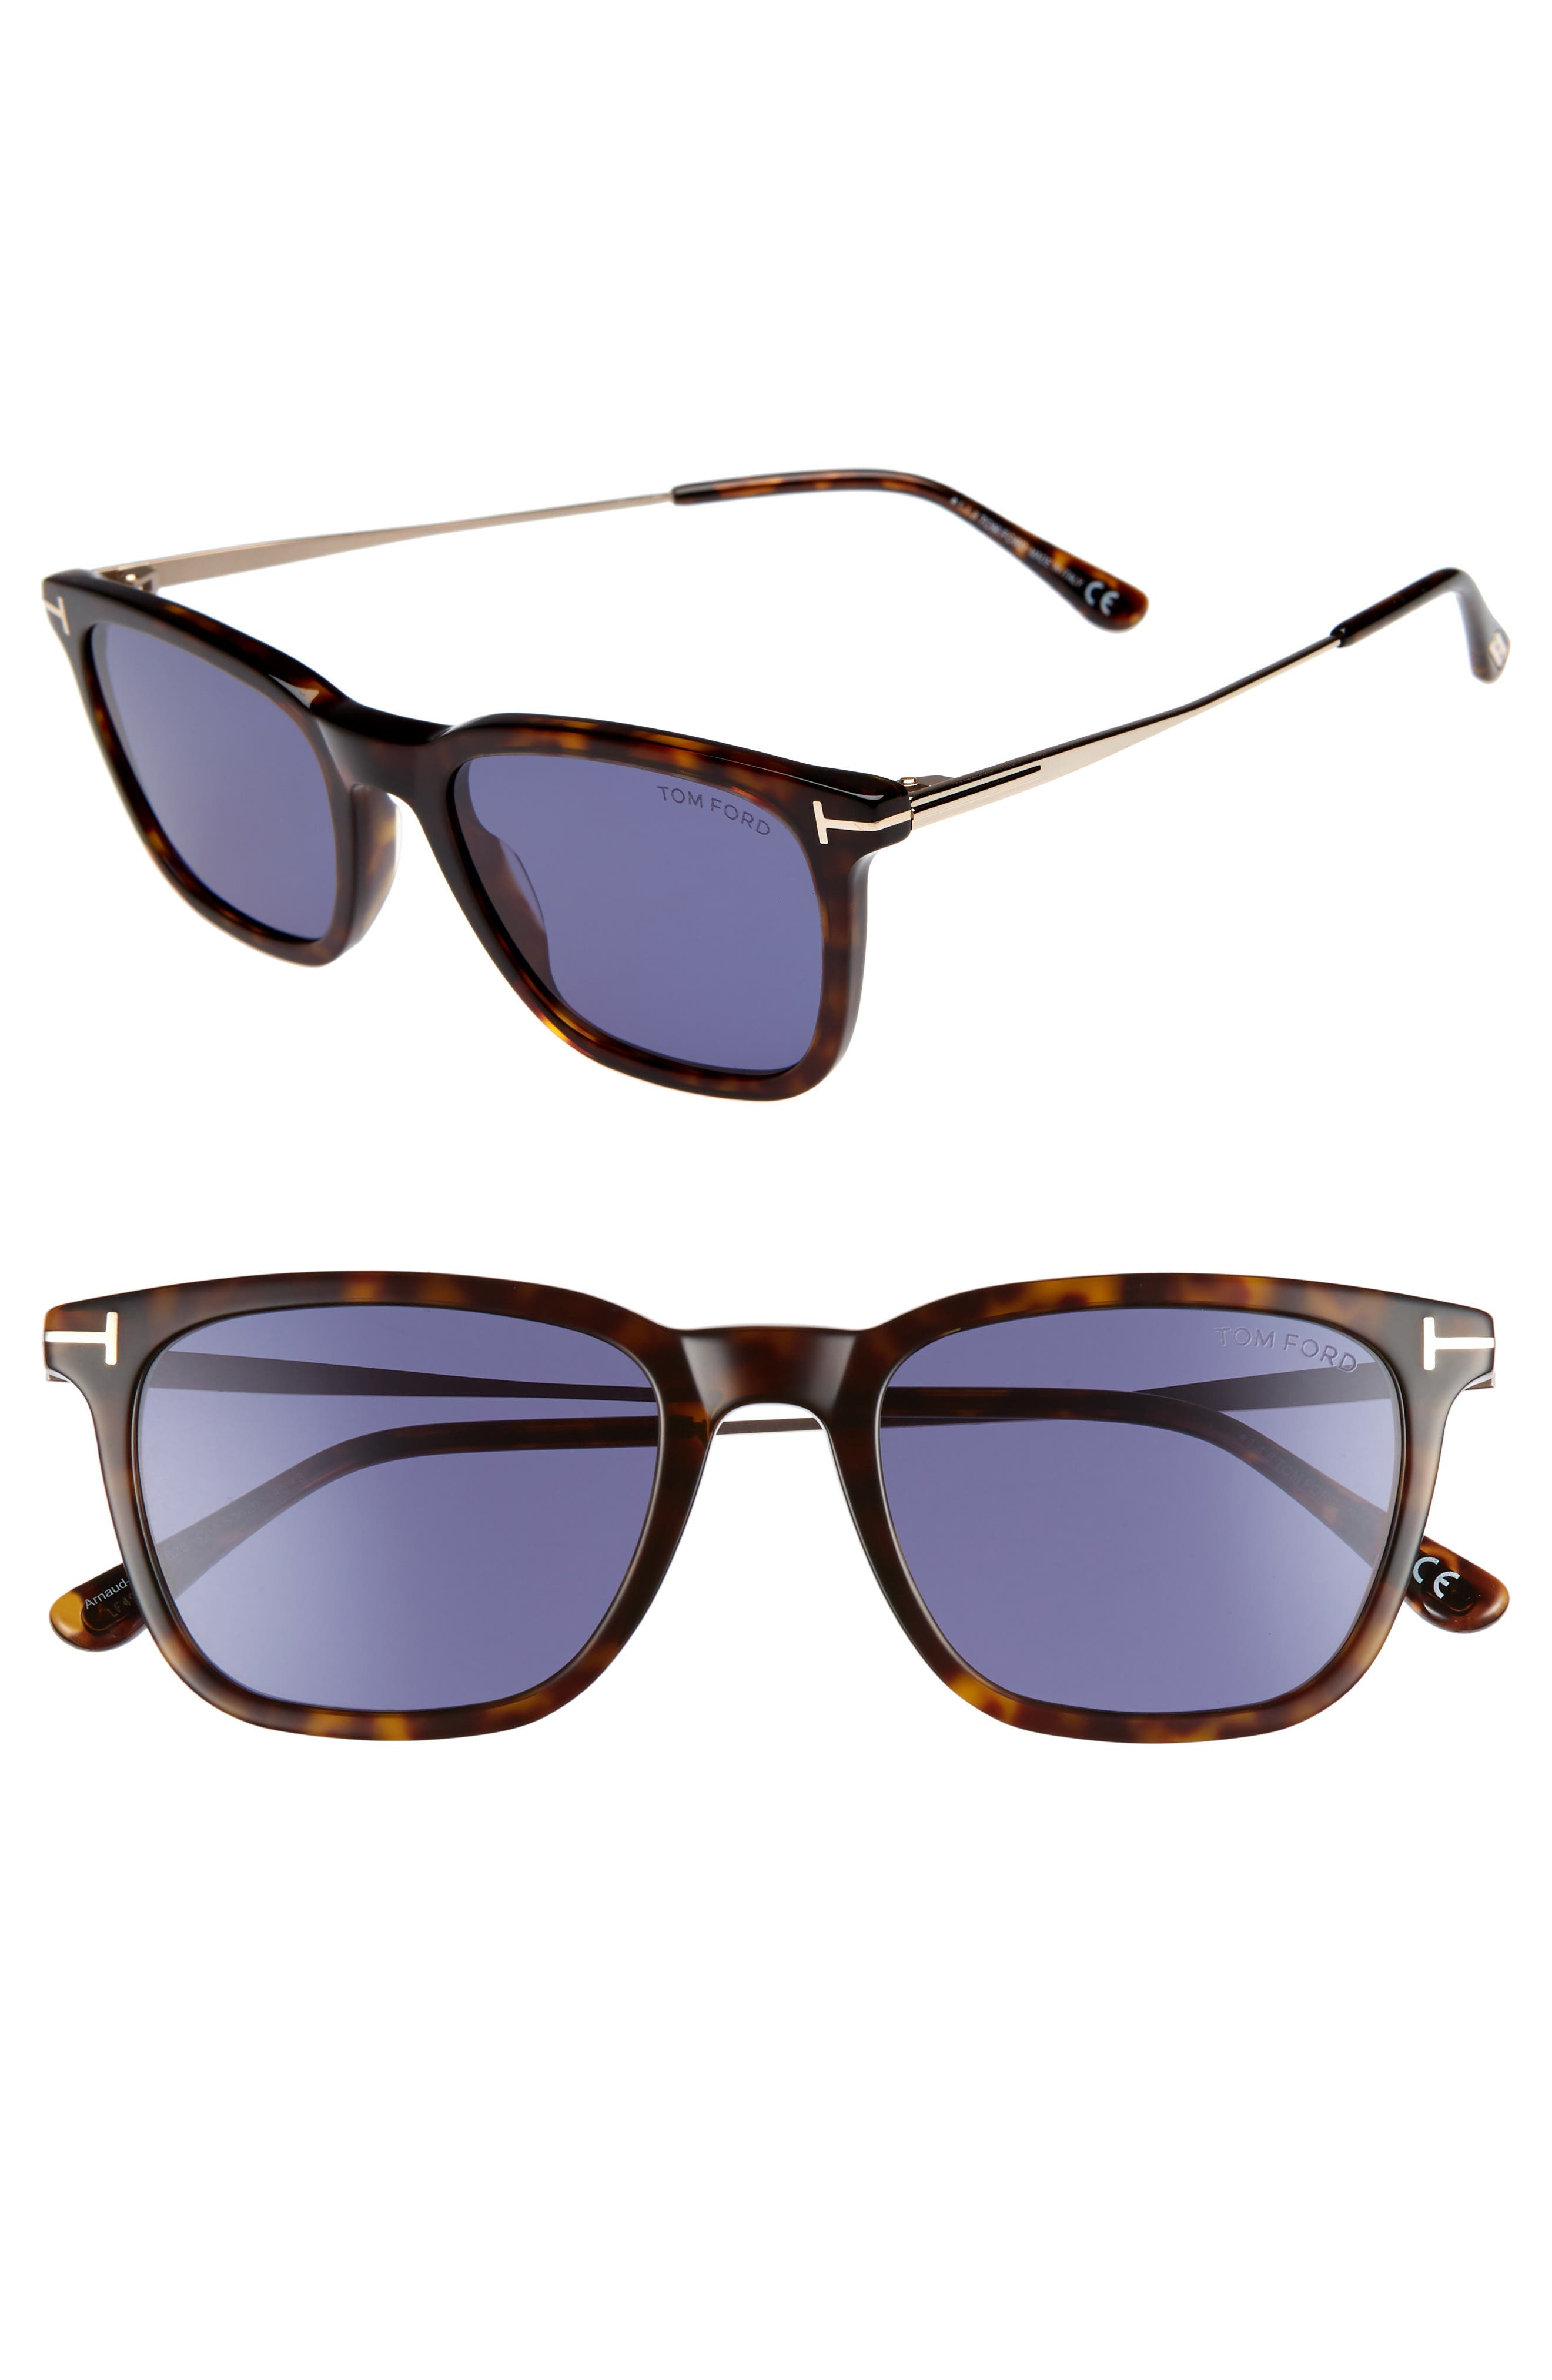 Tom Ford 5m Rectangle Sunglasses - Dark Havana/ Blue